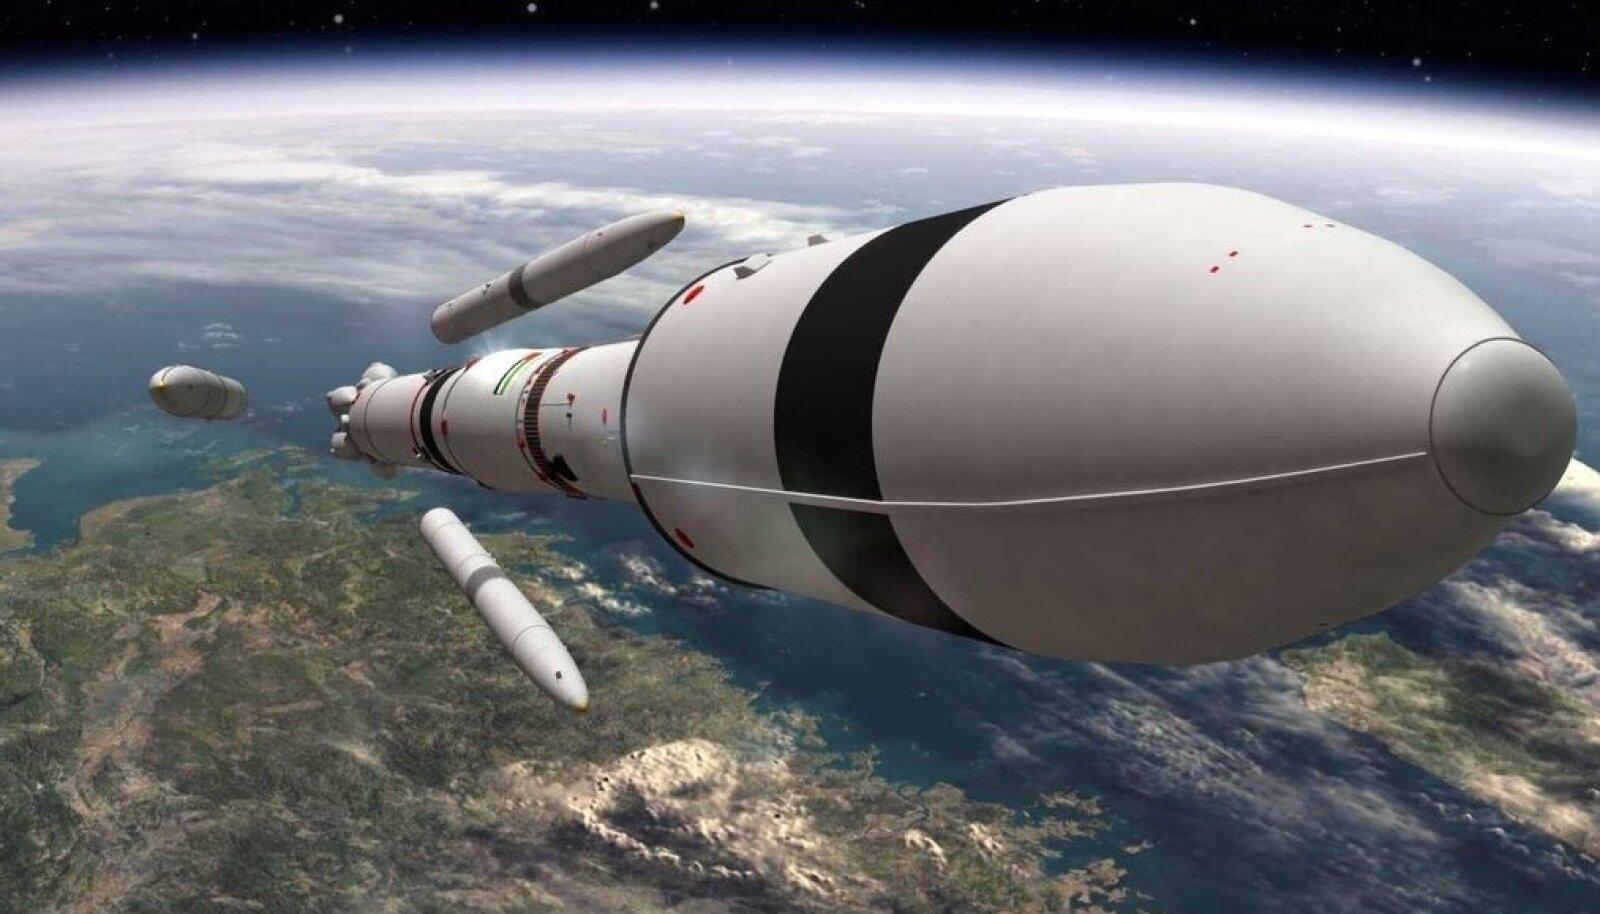 Kunstniku ettekujutus sondi kandvast stardiraketist